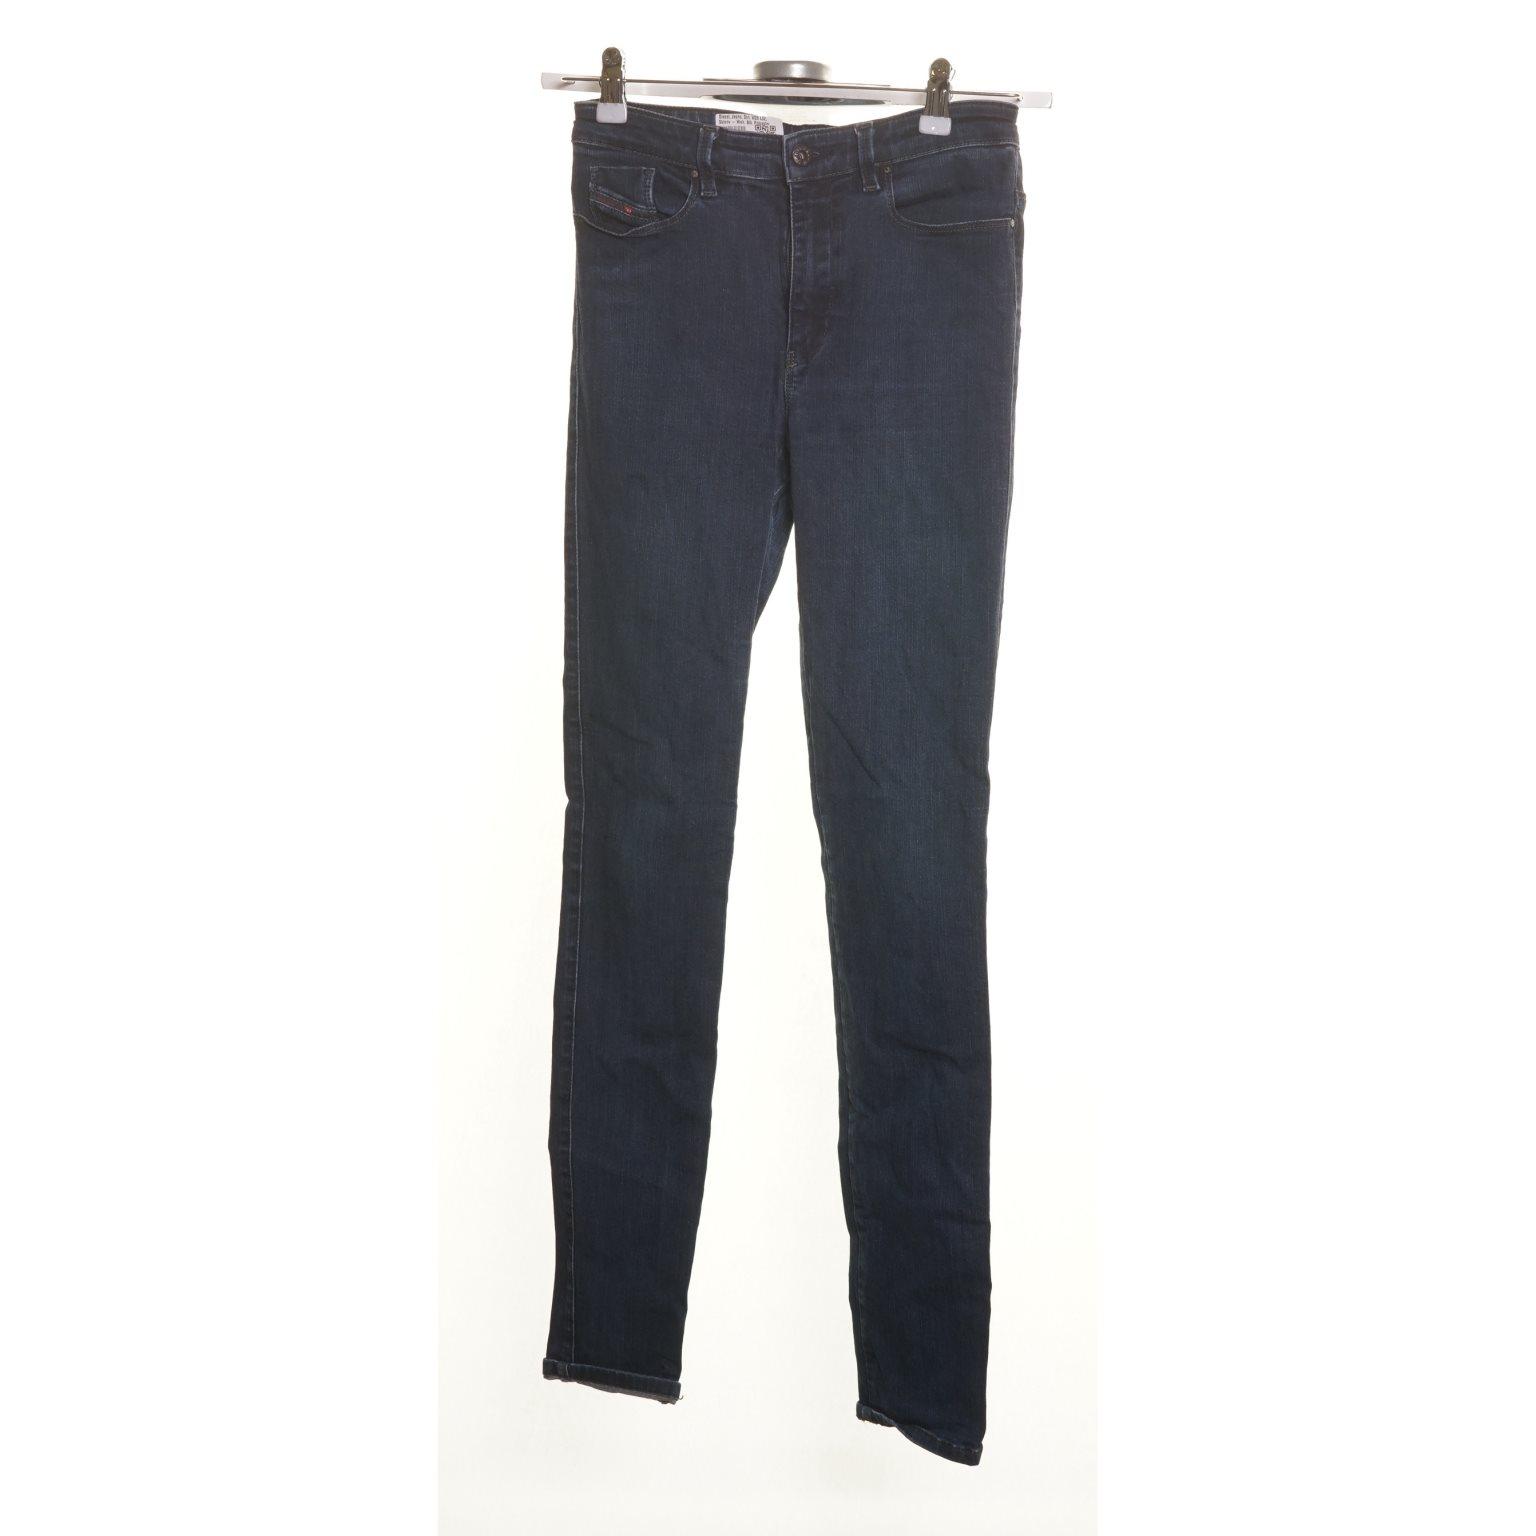 Diesel, Jeans, Strl: W26 L32, Skinny - High, Blå, Polyester